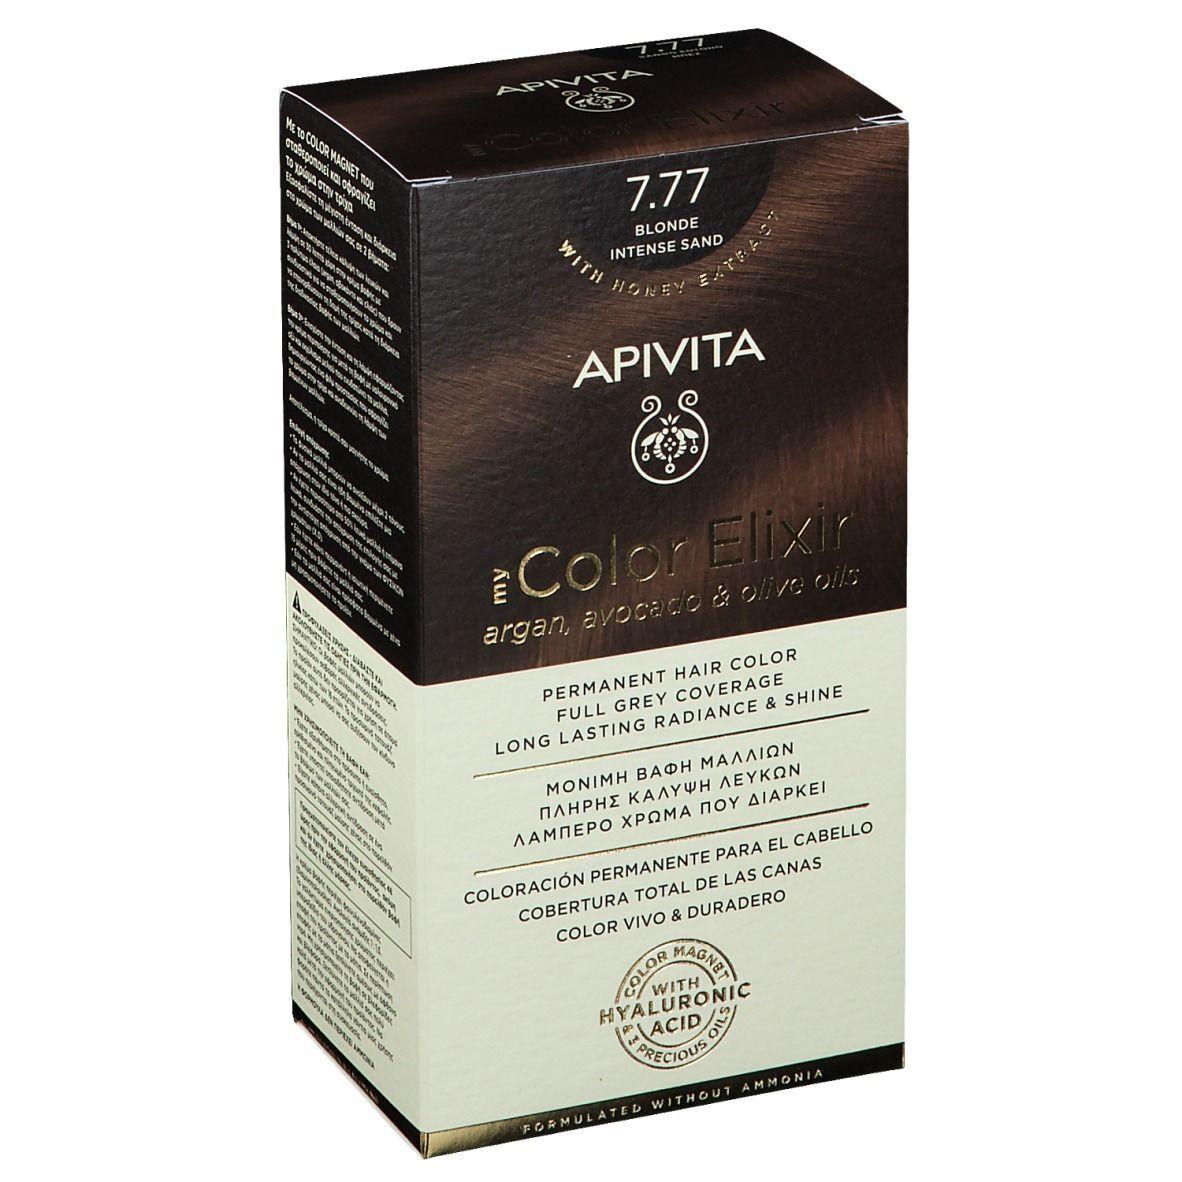 APIVITA My Color Elixir 7.77 Blond Intense Sand ml élixir